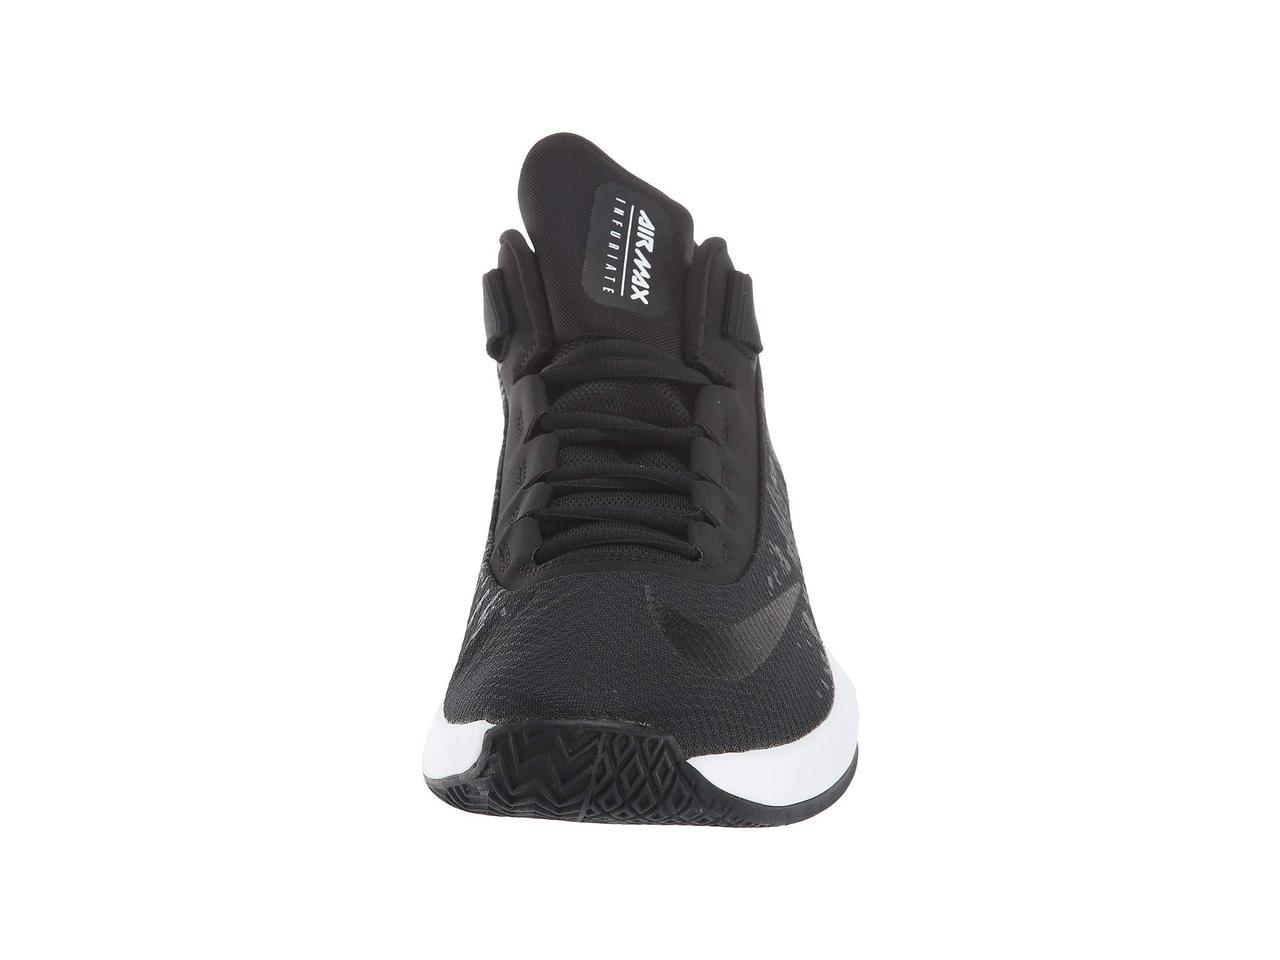 40504c3d59a8 ... Кроссовки Кеды (Оригинал) Nike Air Max Infuriate 2 Mid Black Black